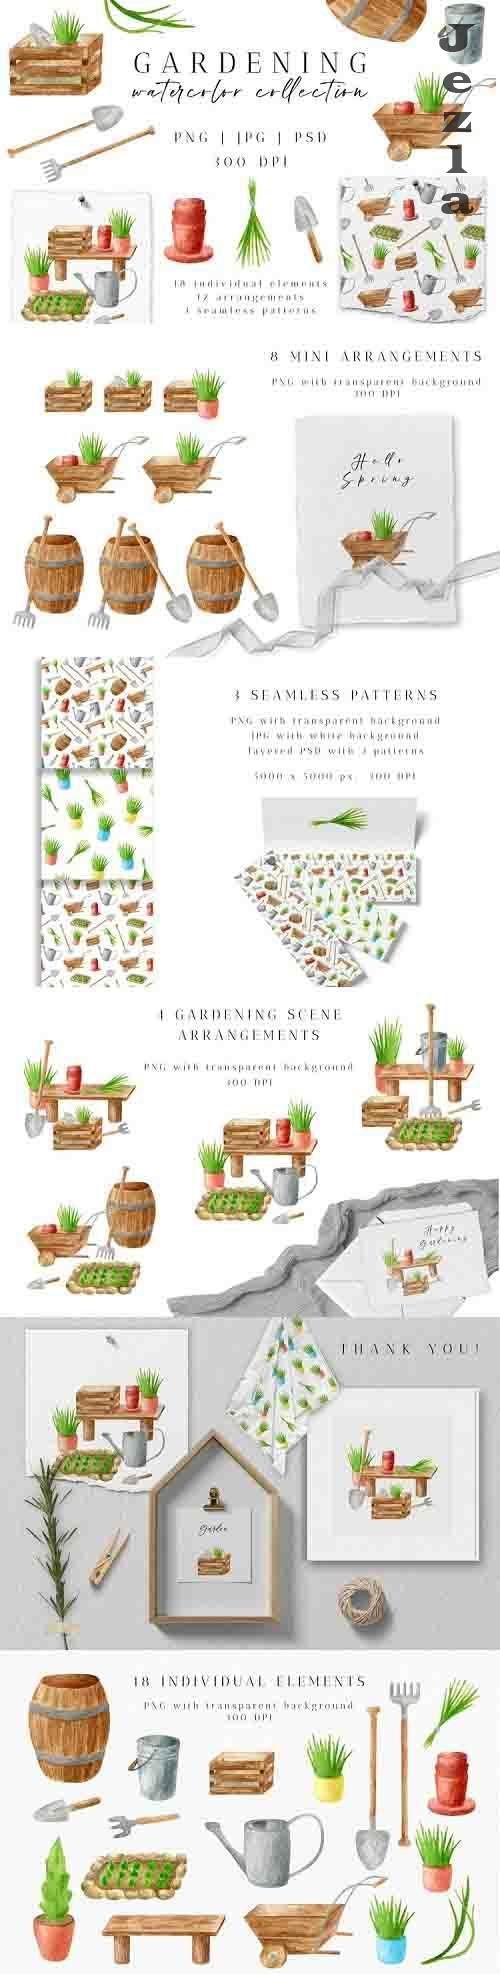 Gardening Watercolor Clipart. Spring Garden Tools PNG Set - 1233725